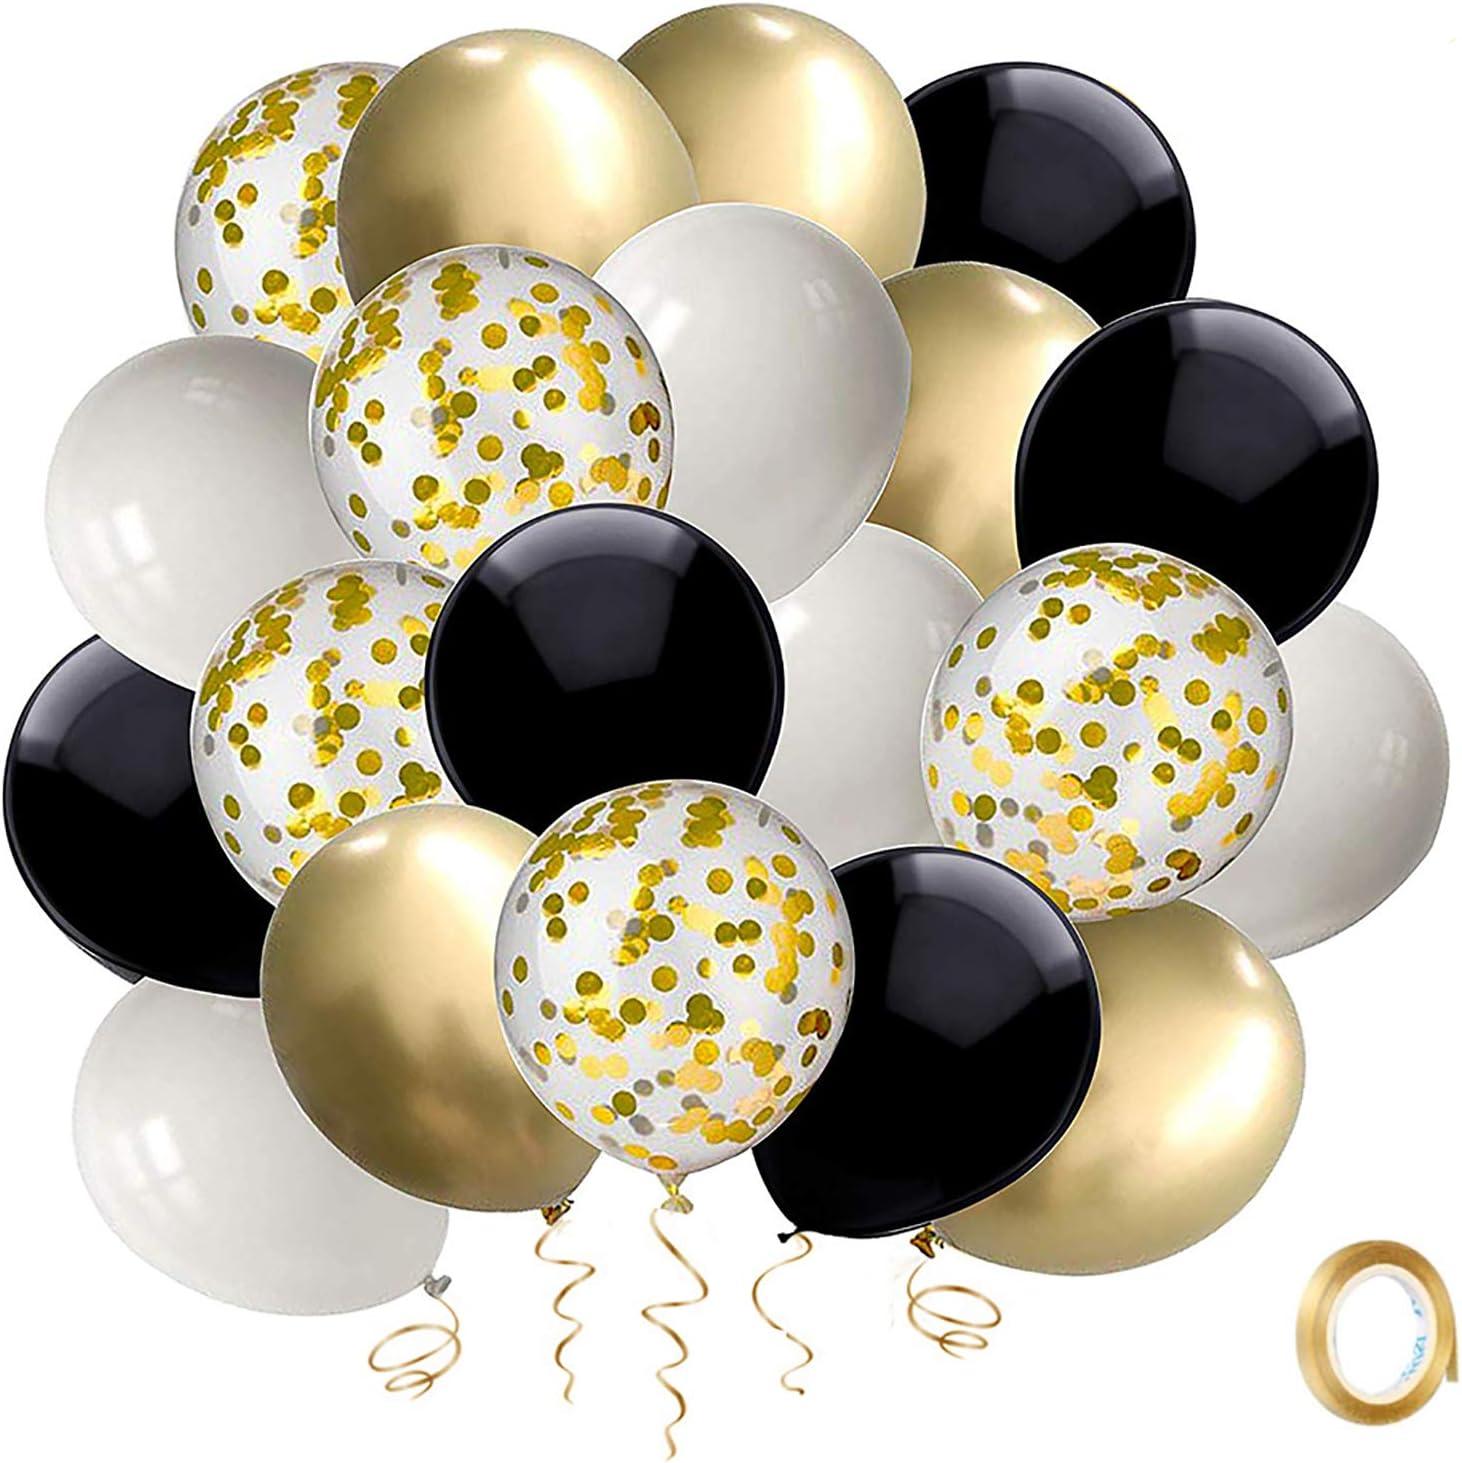 Black Gold White Silver Tassel Garland Black Tie Affair Wedding Black Gold Party Decor Black Gold Wedding Decorations White and Gold